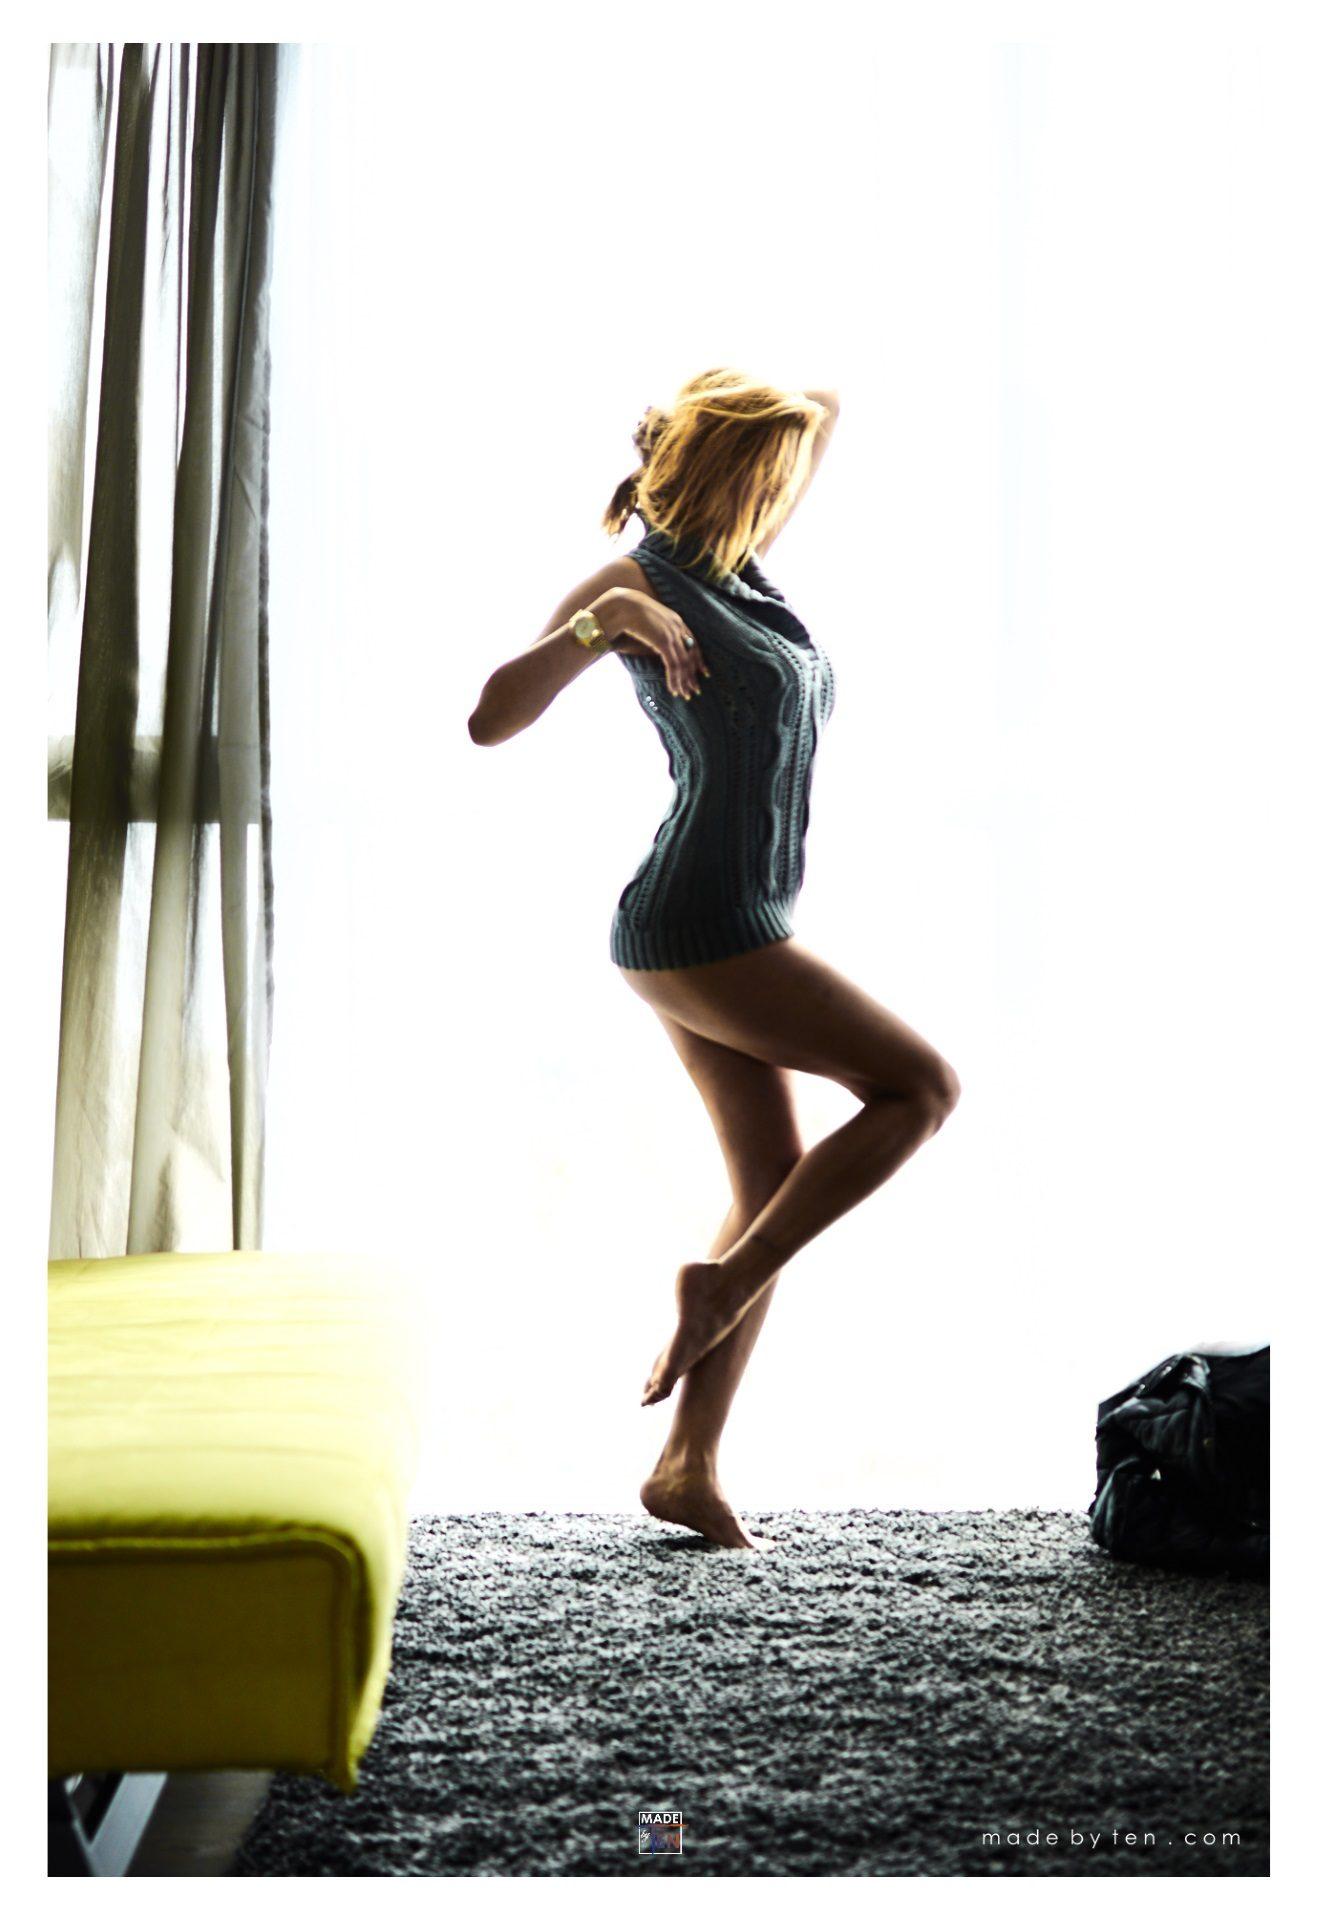 Woman Modern Boudoir Pin-up Window - GTA Women Portrait Photography